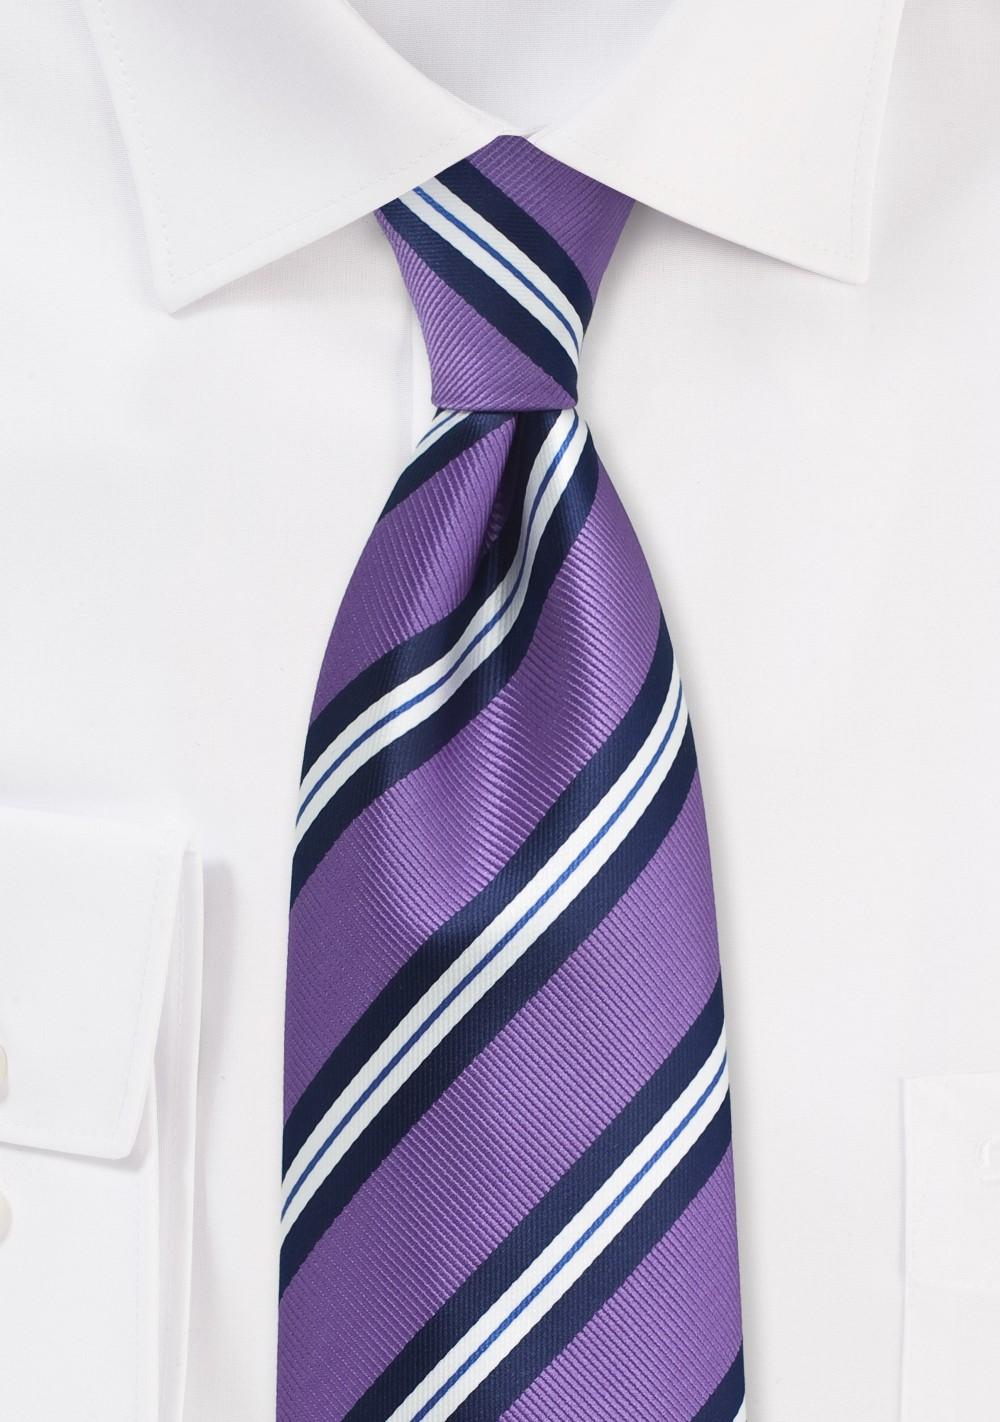 Repp Striped Kids Tie in Lilac